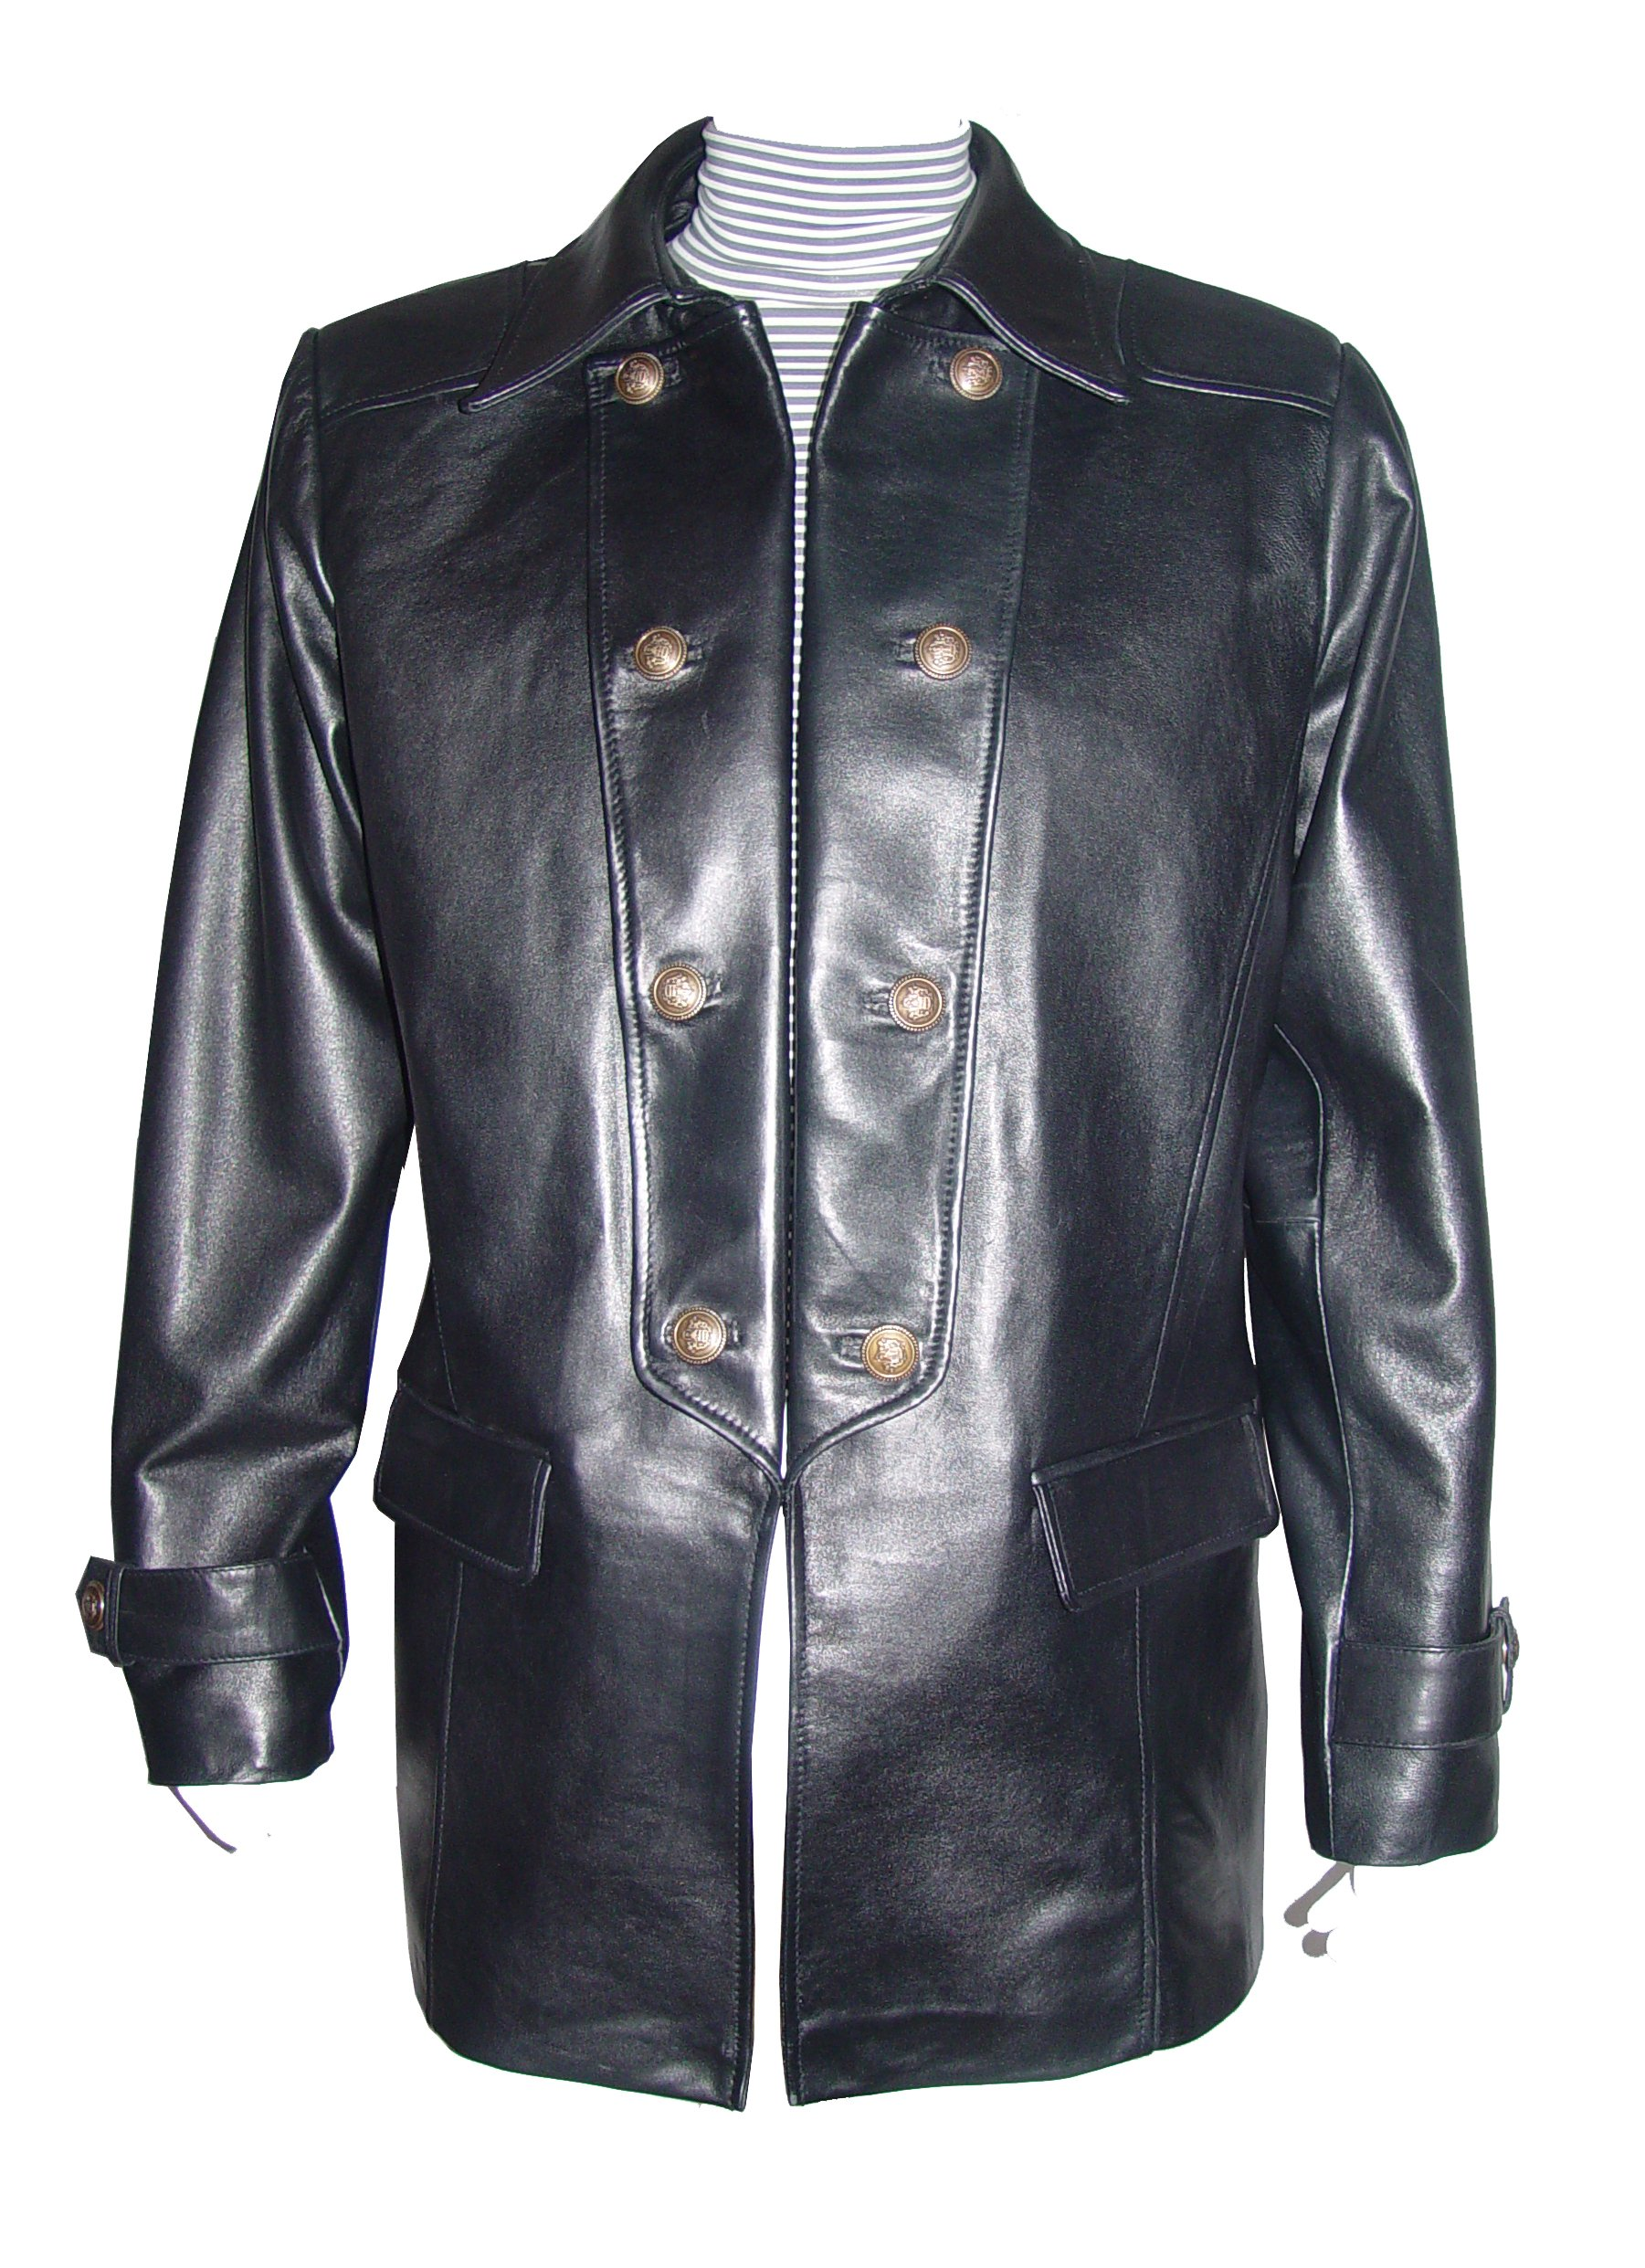 Nettailor Tall Big Man 1070 BIG TALL Size 4 Season Leather Fancy Casual Blazer by NETTAILOR (Image #7)